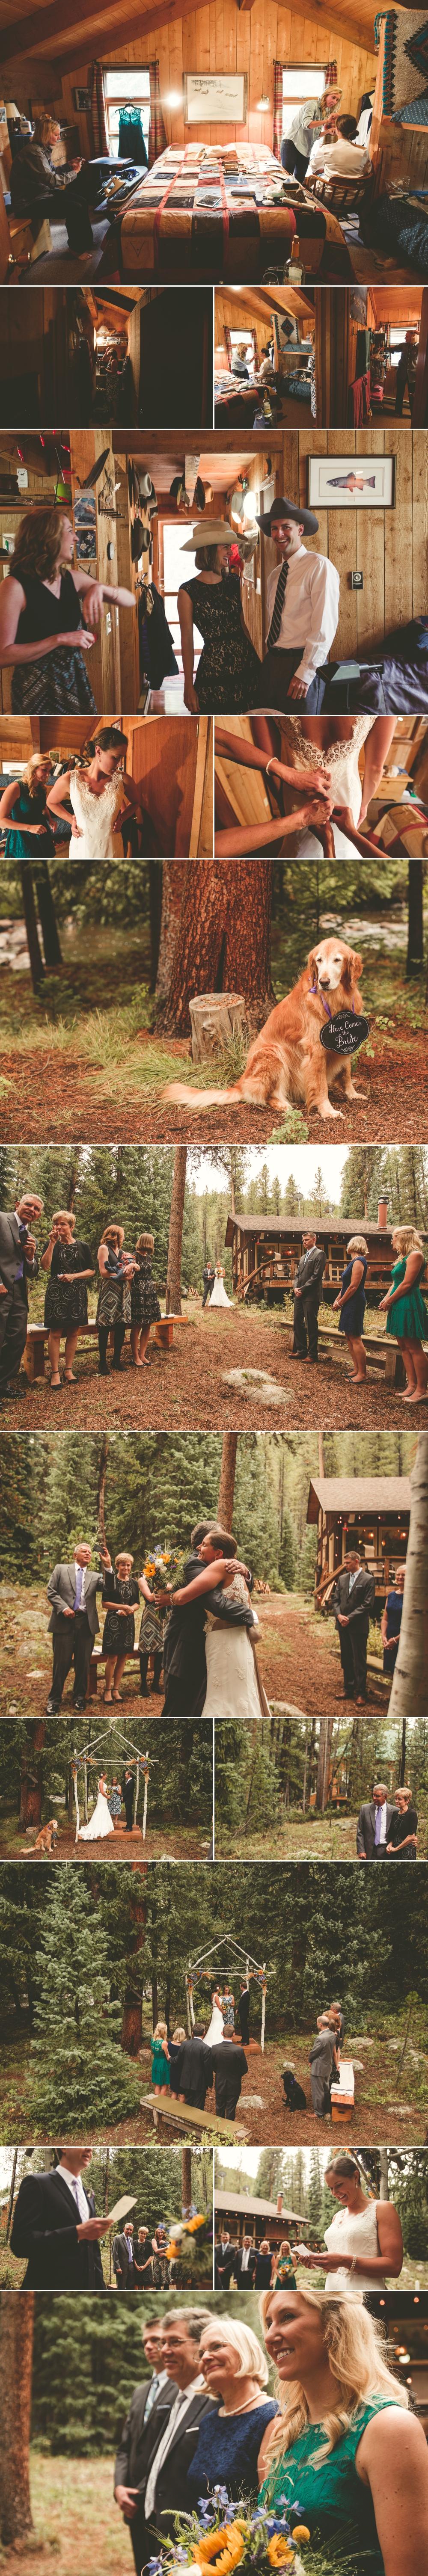 jason_domingues_photography_best_photographer_kansas_city_ks_kc_creative_wedding_portrait_meredith_colorado_co_mountain_4.jpg